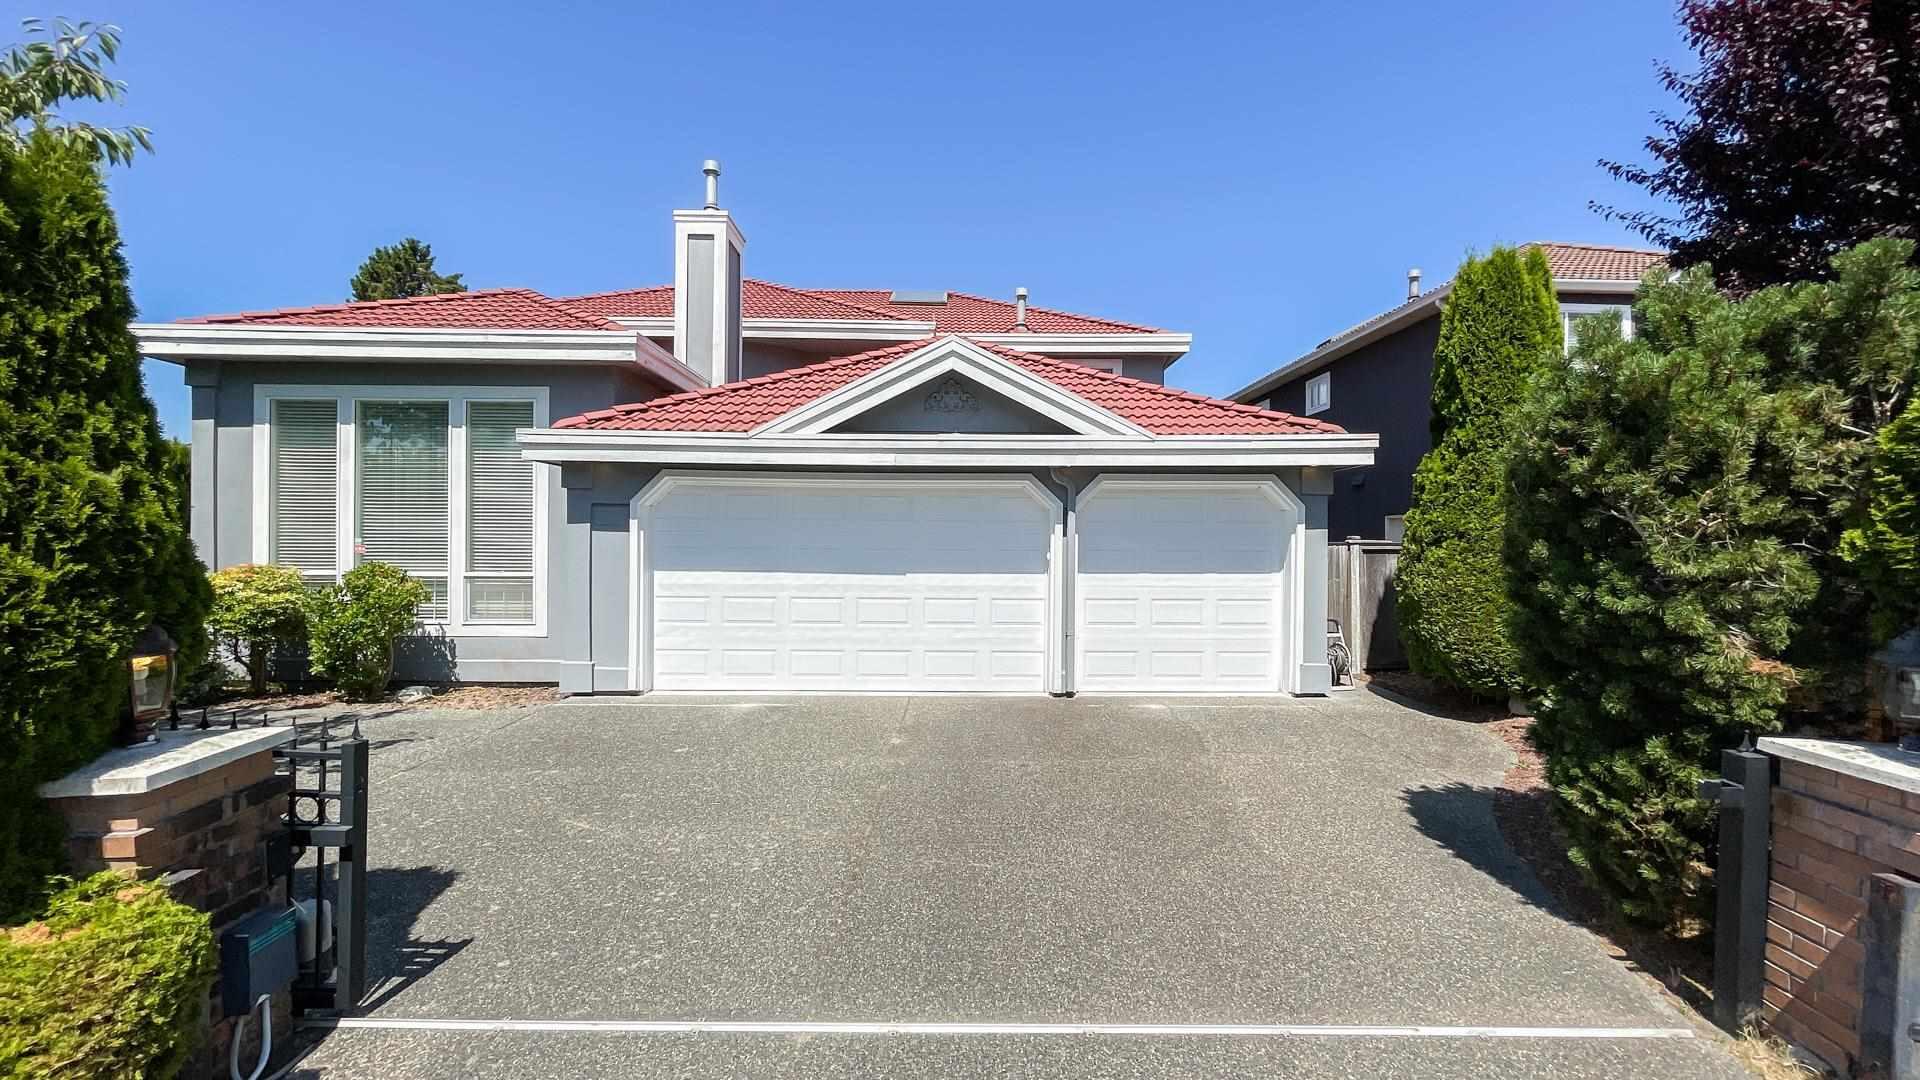 8680 CADOGAN ROAD - Lackner House/Single Family for sale, 5 Bedrooms (R2603724)